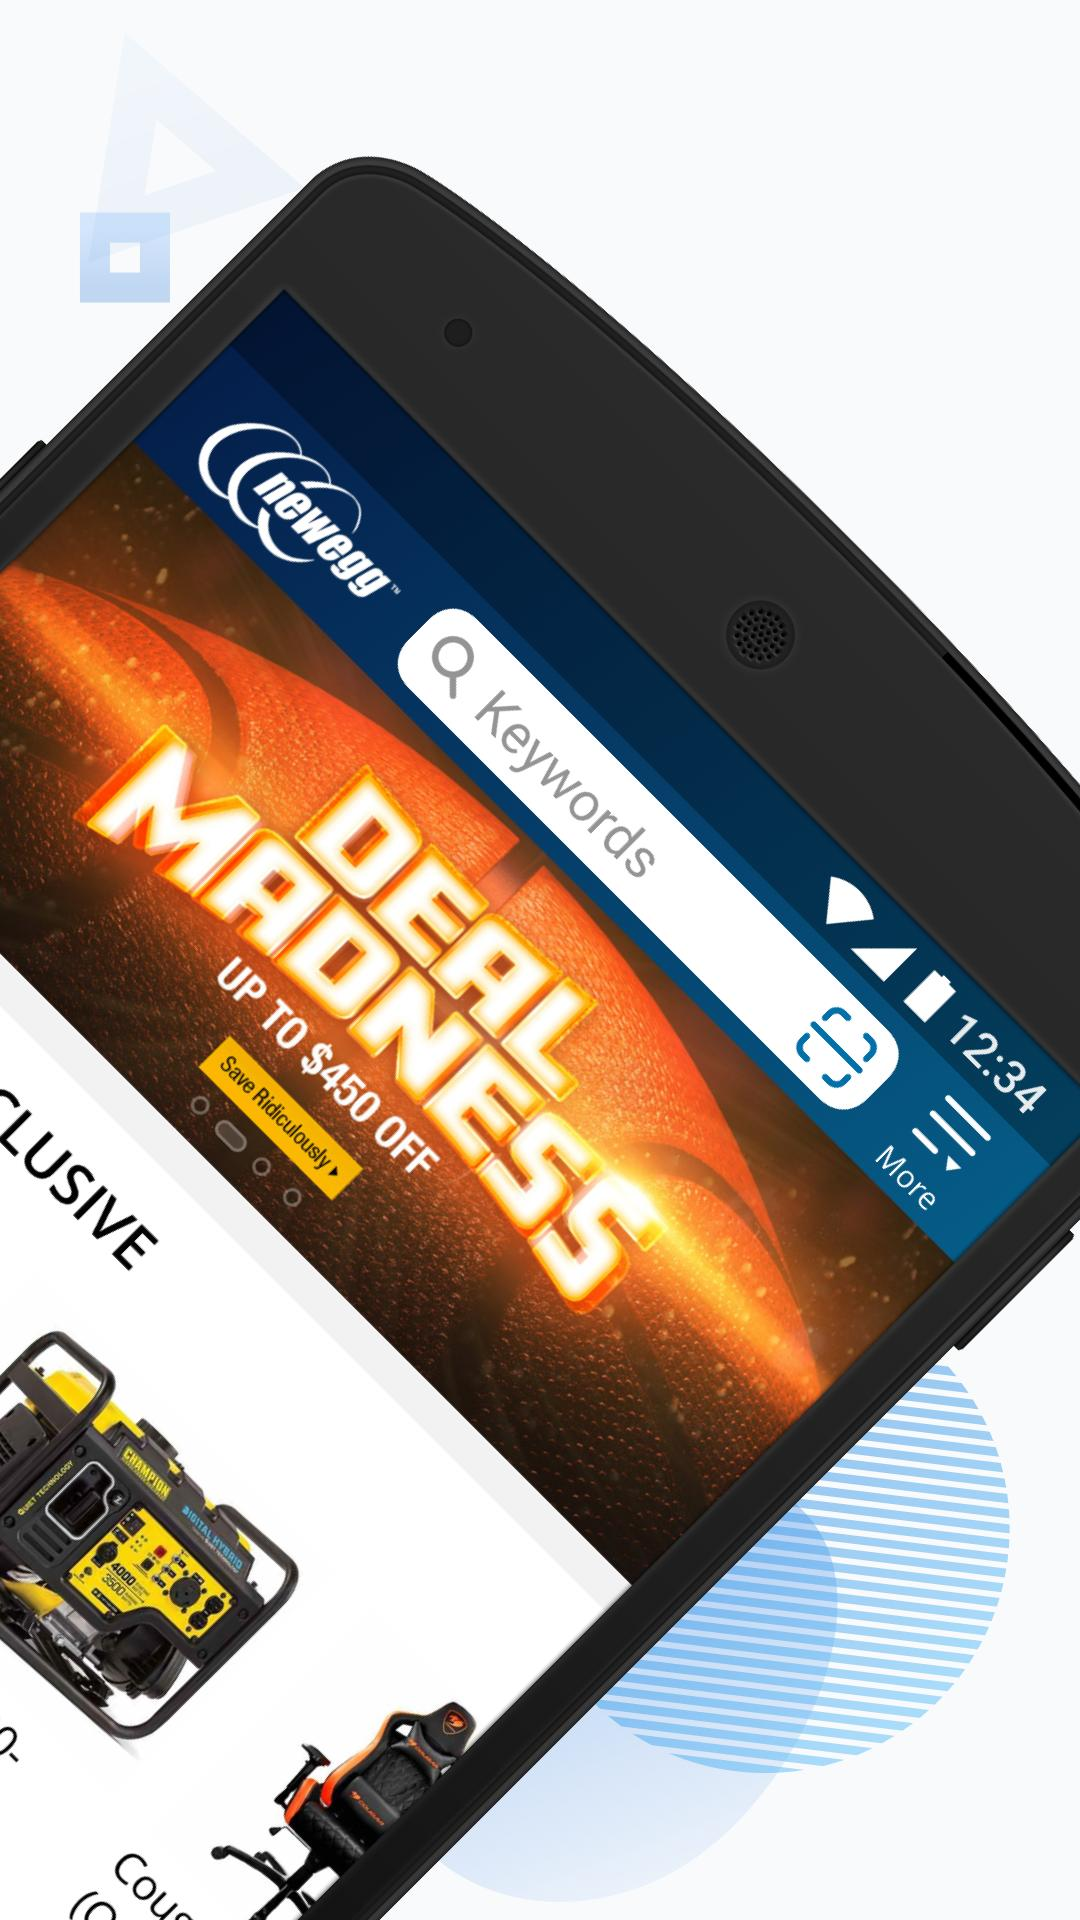 Newegg Mobile 5.8.0 Screenshot 2